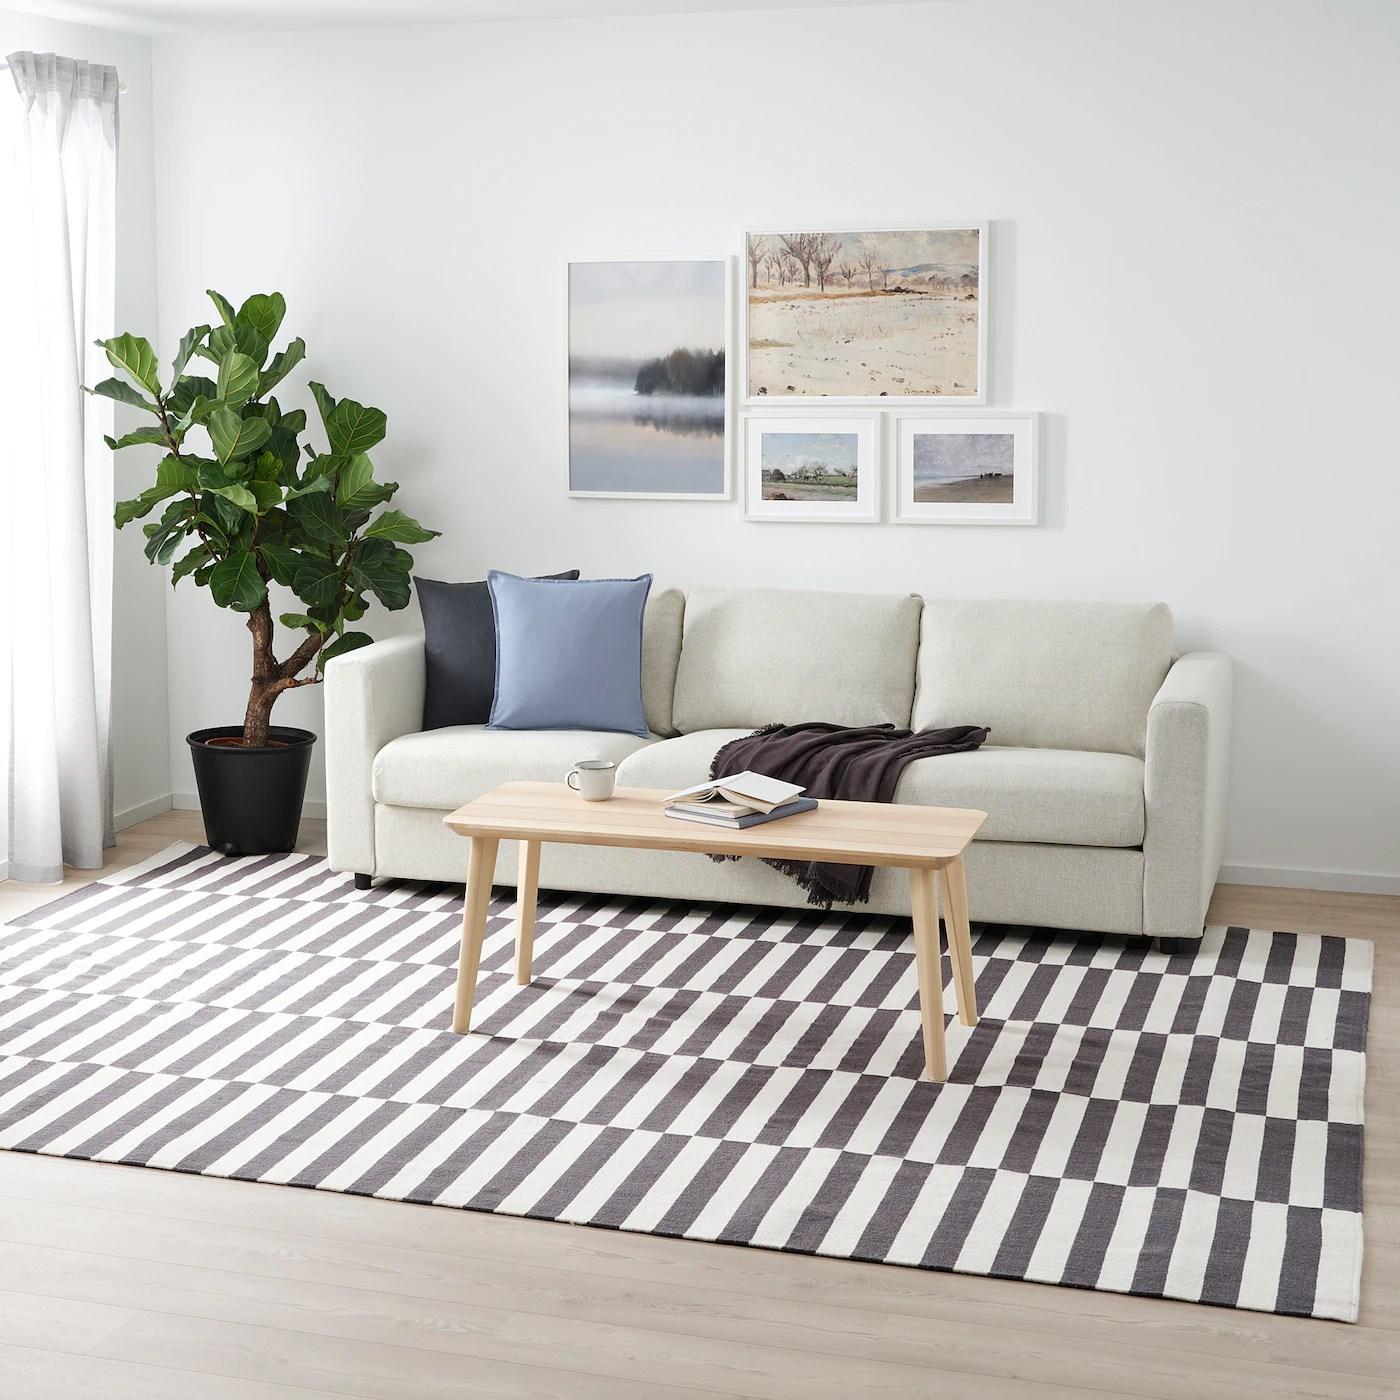 stockholm 2017 tapis tisse a plat fait main raye gris 250x350 cm